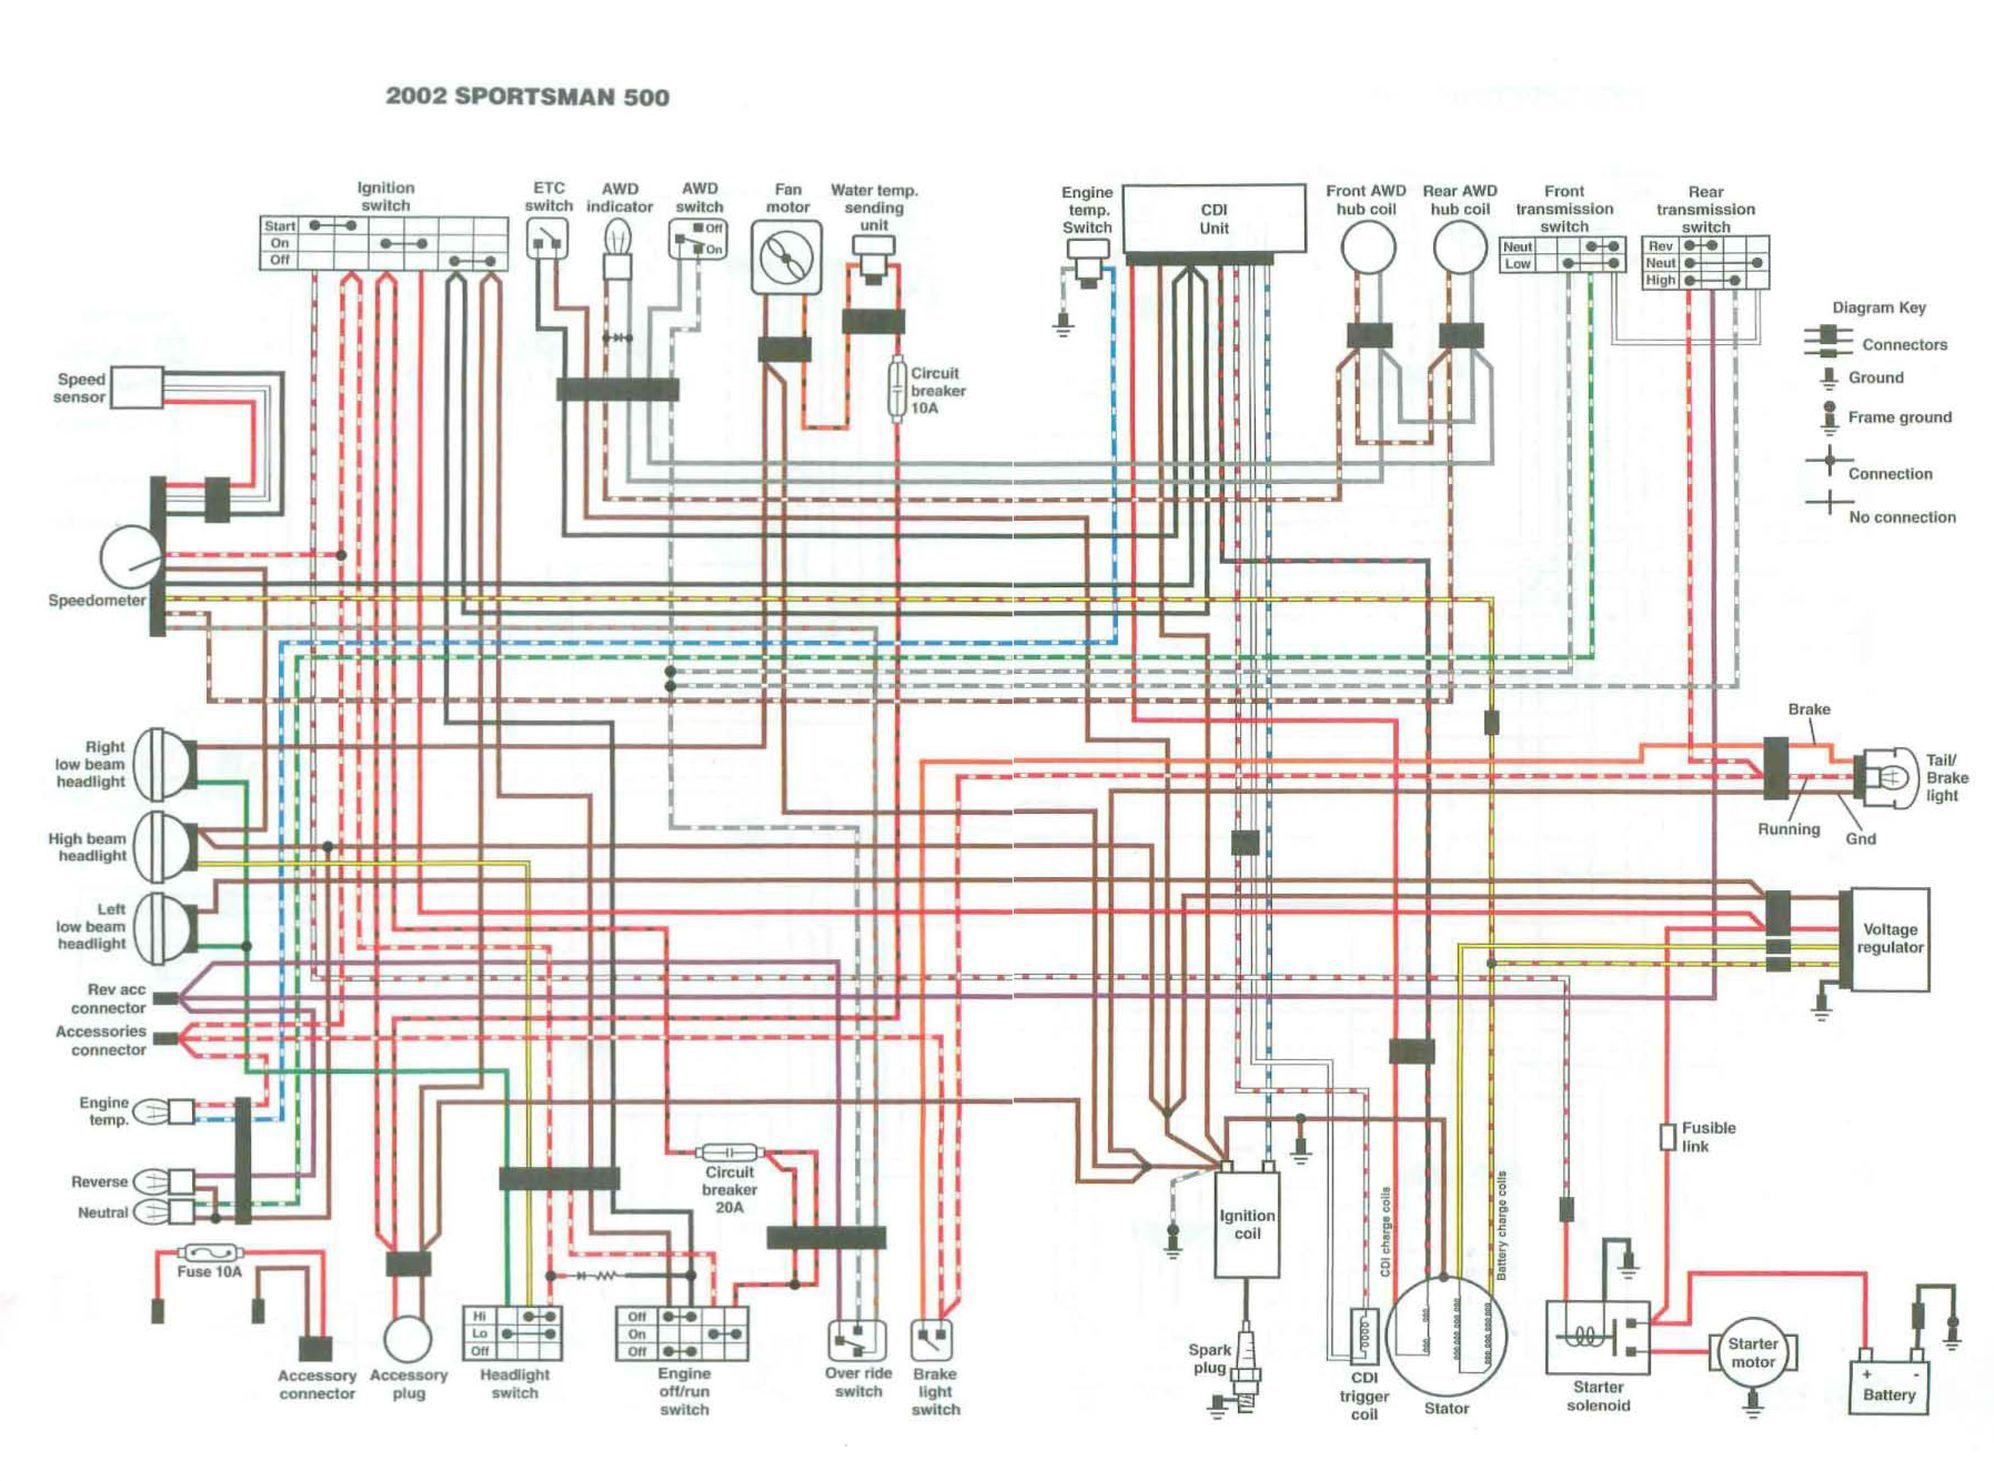 CW_3497] Polaris 335 Sportsman Parts Diagram Also Polaris Sportsman 500  Wiring Download DiagramBemua Dict Alia Bdel Joni Hete Dome Mohammedshrine Librar Wiring 101